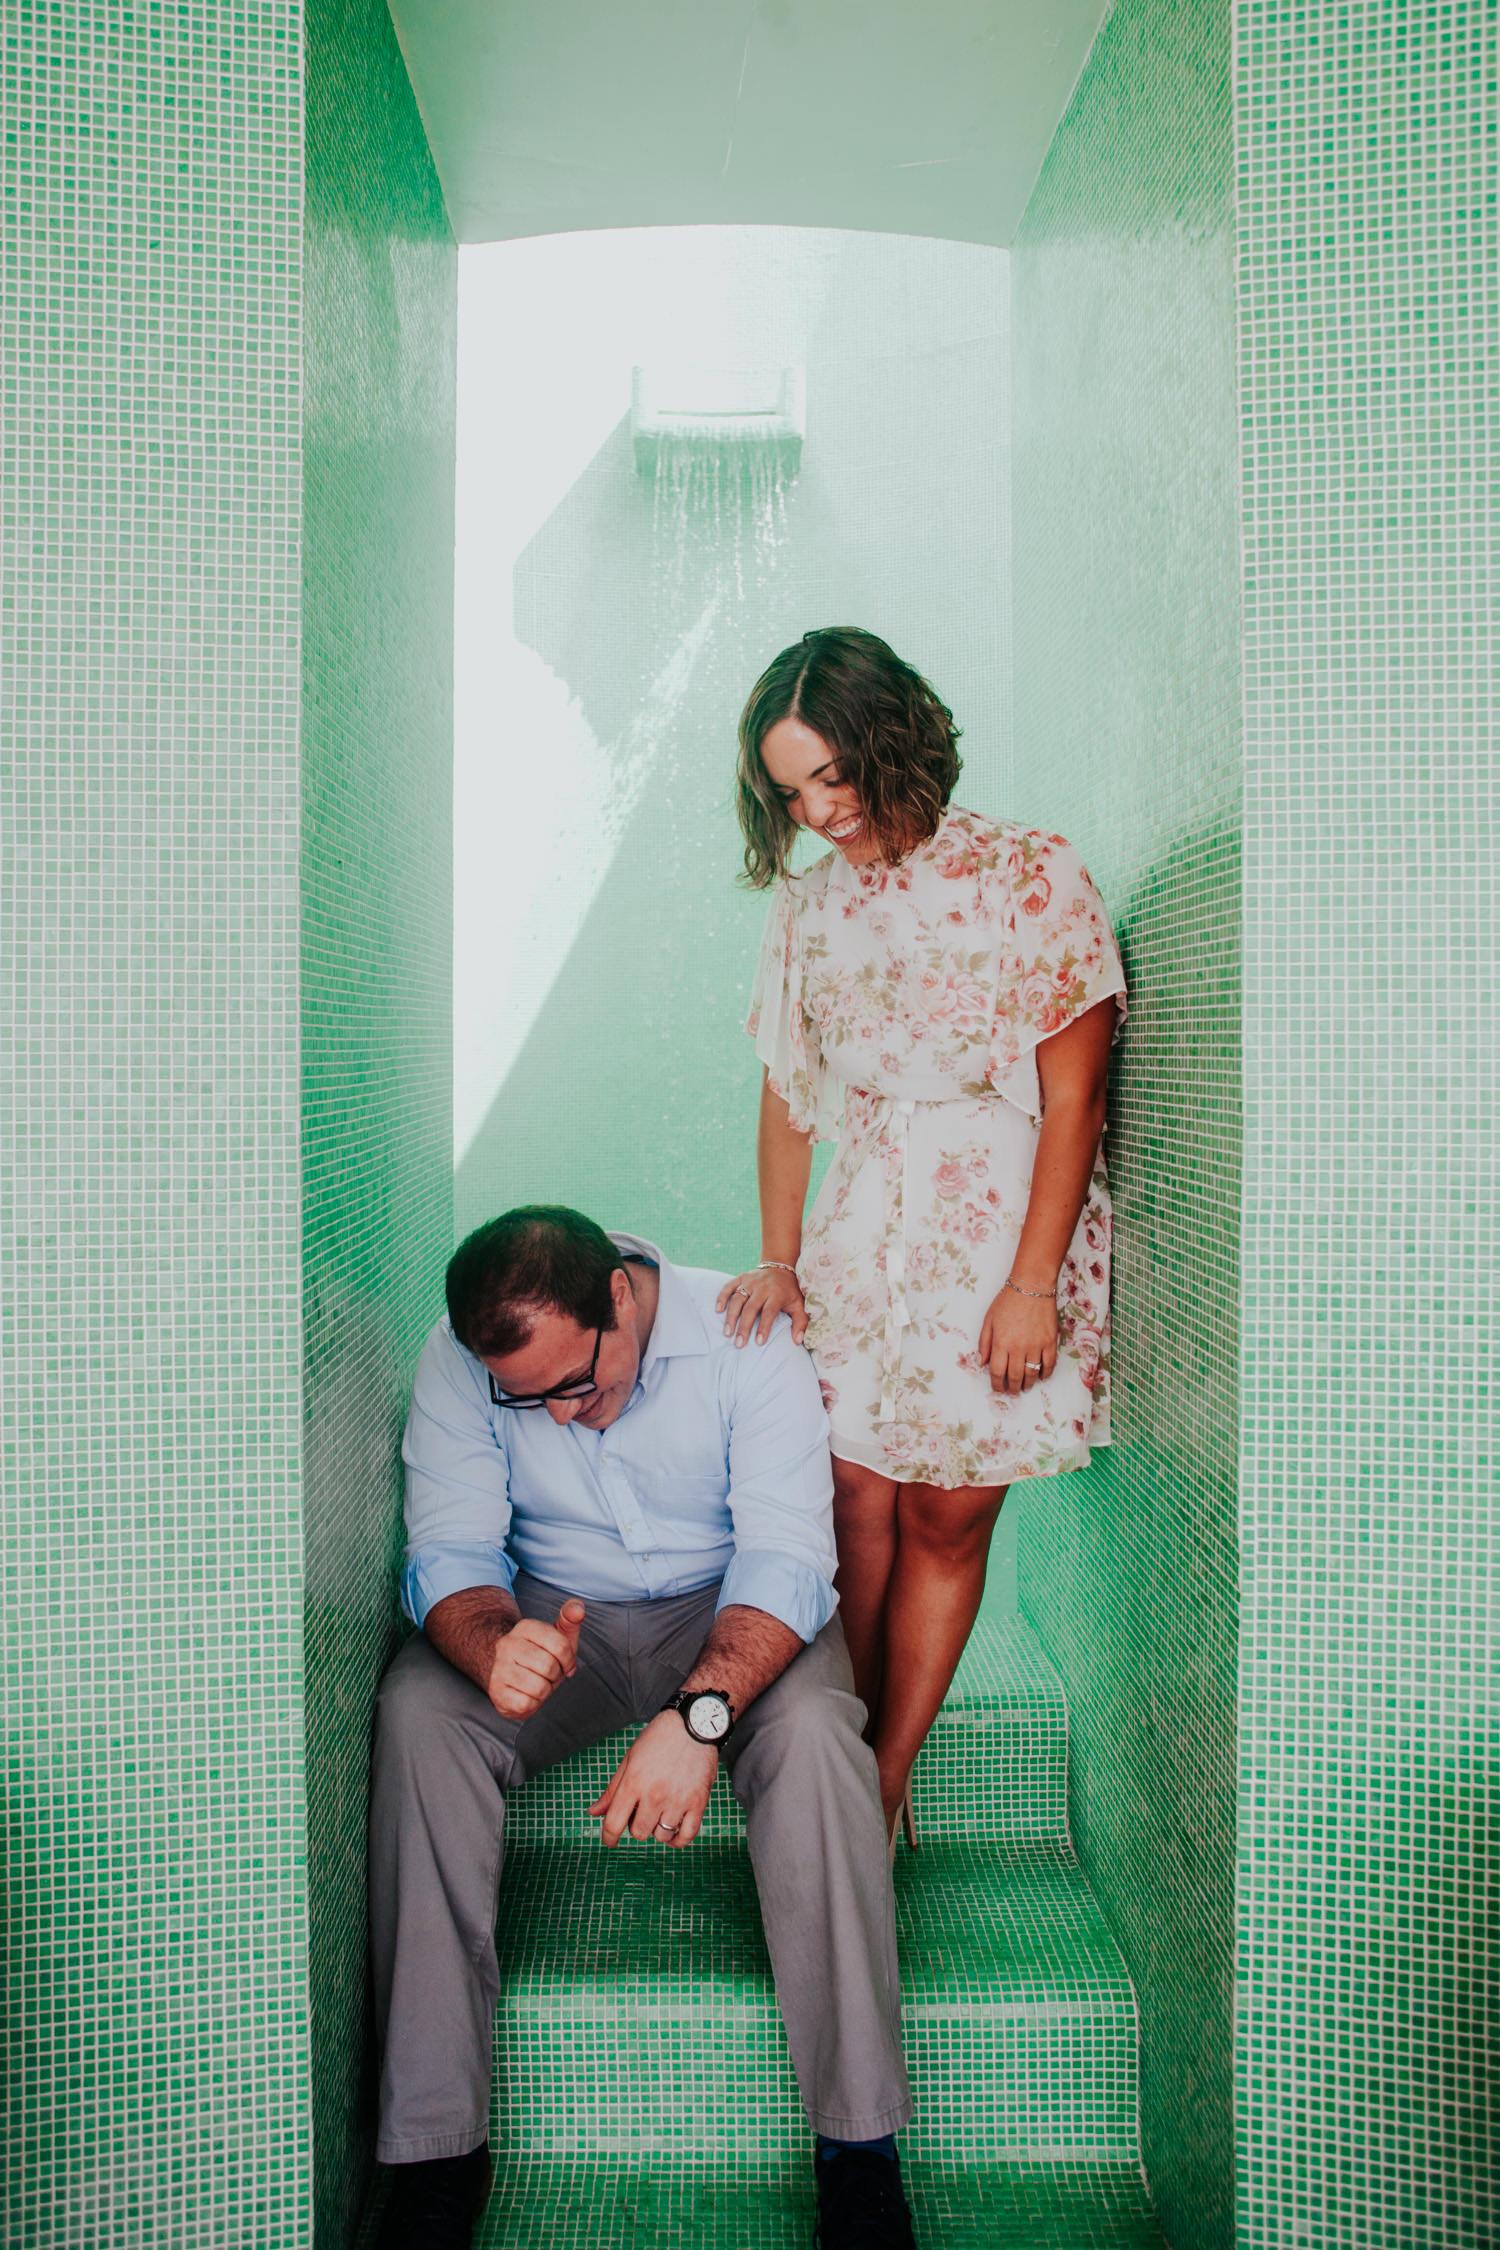 Fotografo-Boda-Hotel-Condesa-DF-Mexico-CDMX-Photography-Wedding-Pierce-19.jpg